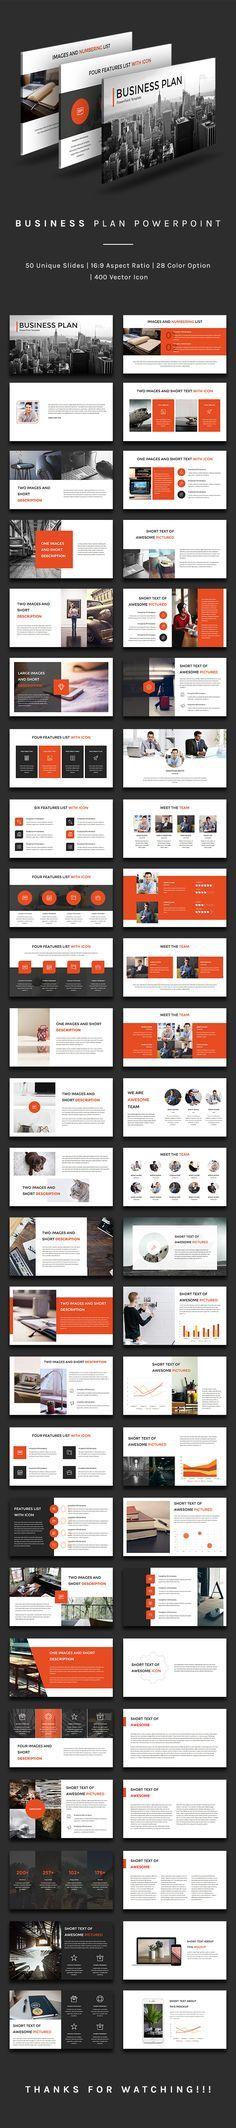 Business Plan Powerpoint — Powerpoint PPT #marketing presentation #clean presentation • Download ➝ https://graphicriver.net/item/business-plan-powerpoint/19193700?ref=pxcr